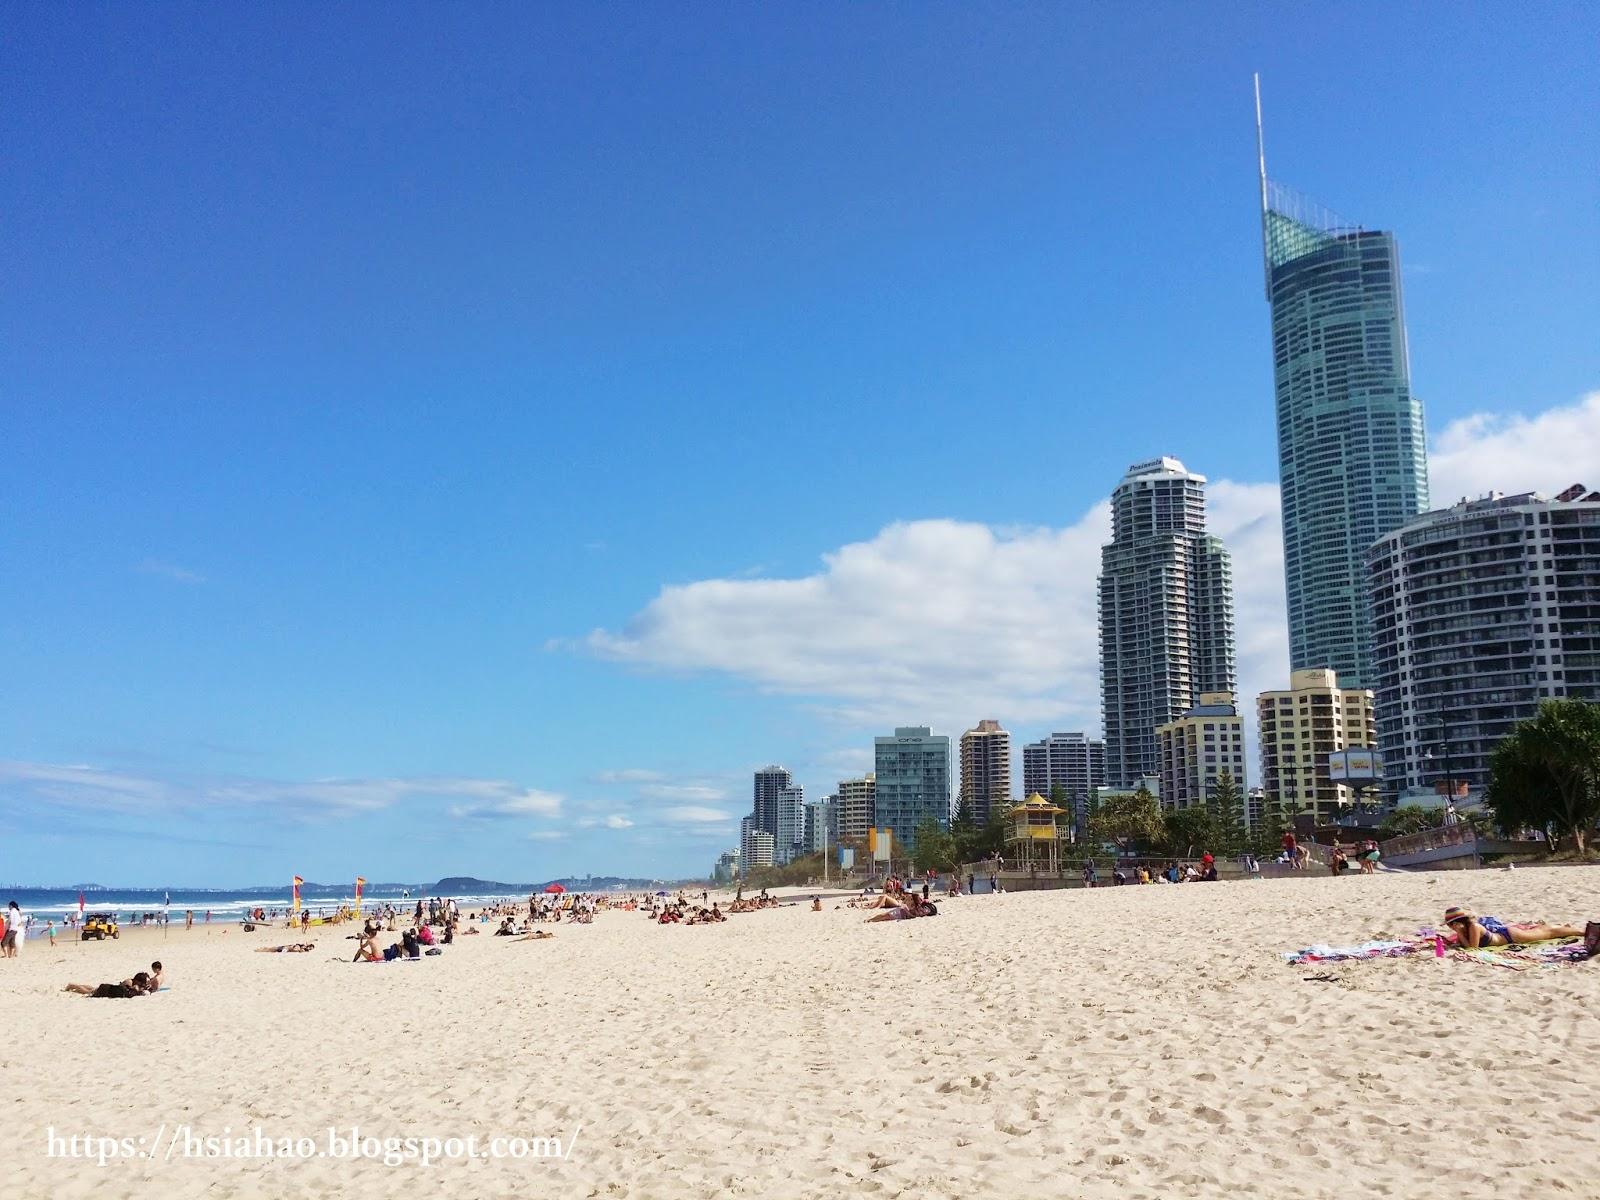 澳洲-黃金海岸-衝浪者天堂-布里斯本-景點-iVenture-優惠-套票卡-旅遊-自由行-Gold-Coast-Tourist-Attraction-Discount-Card-Travel-Australia